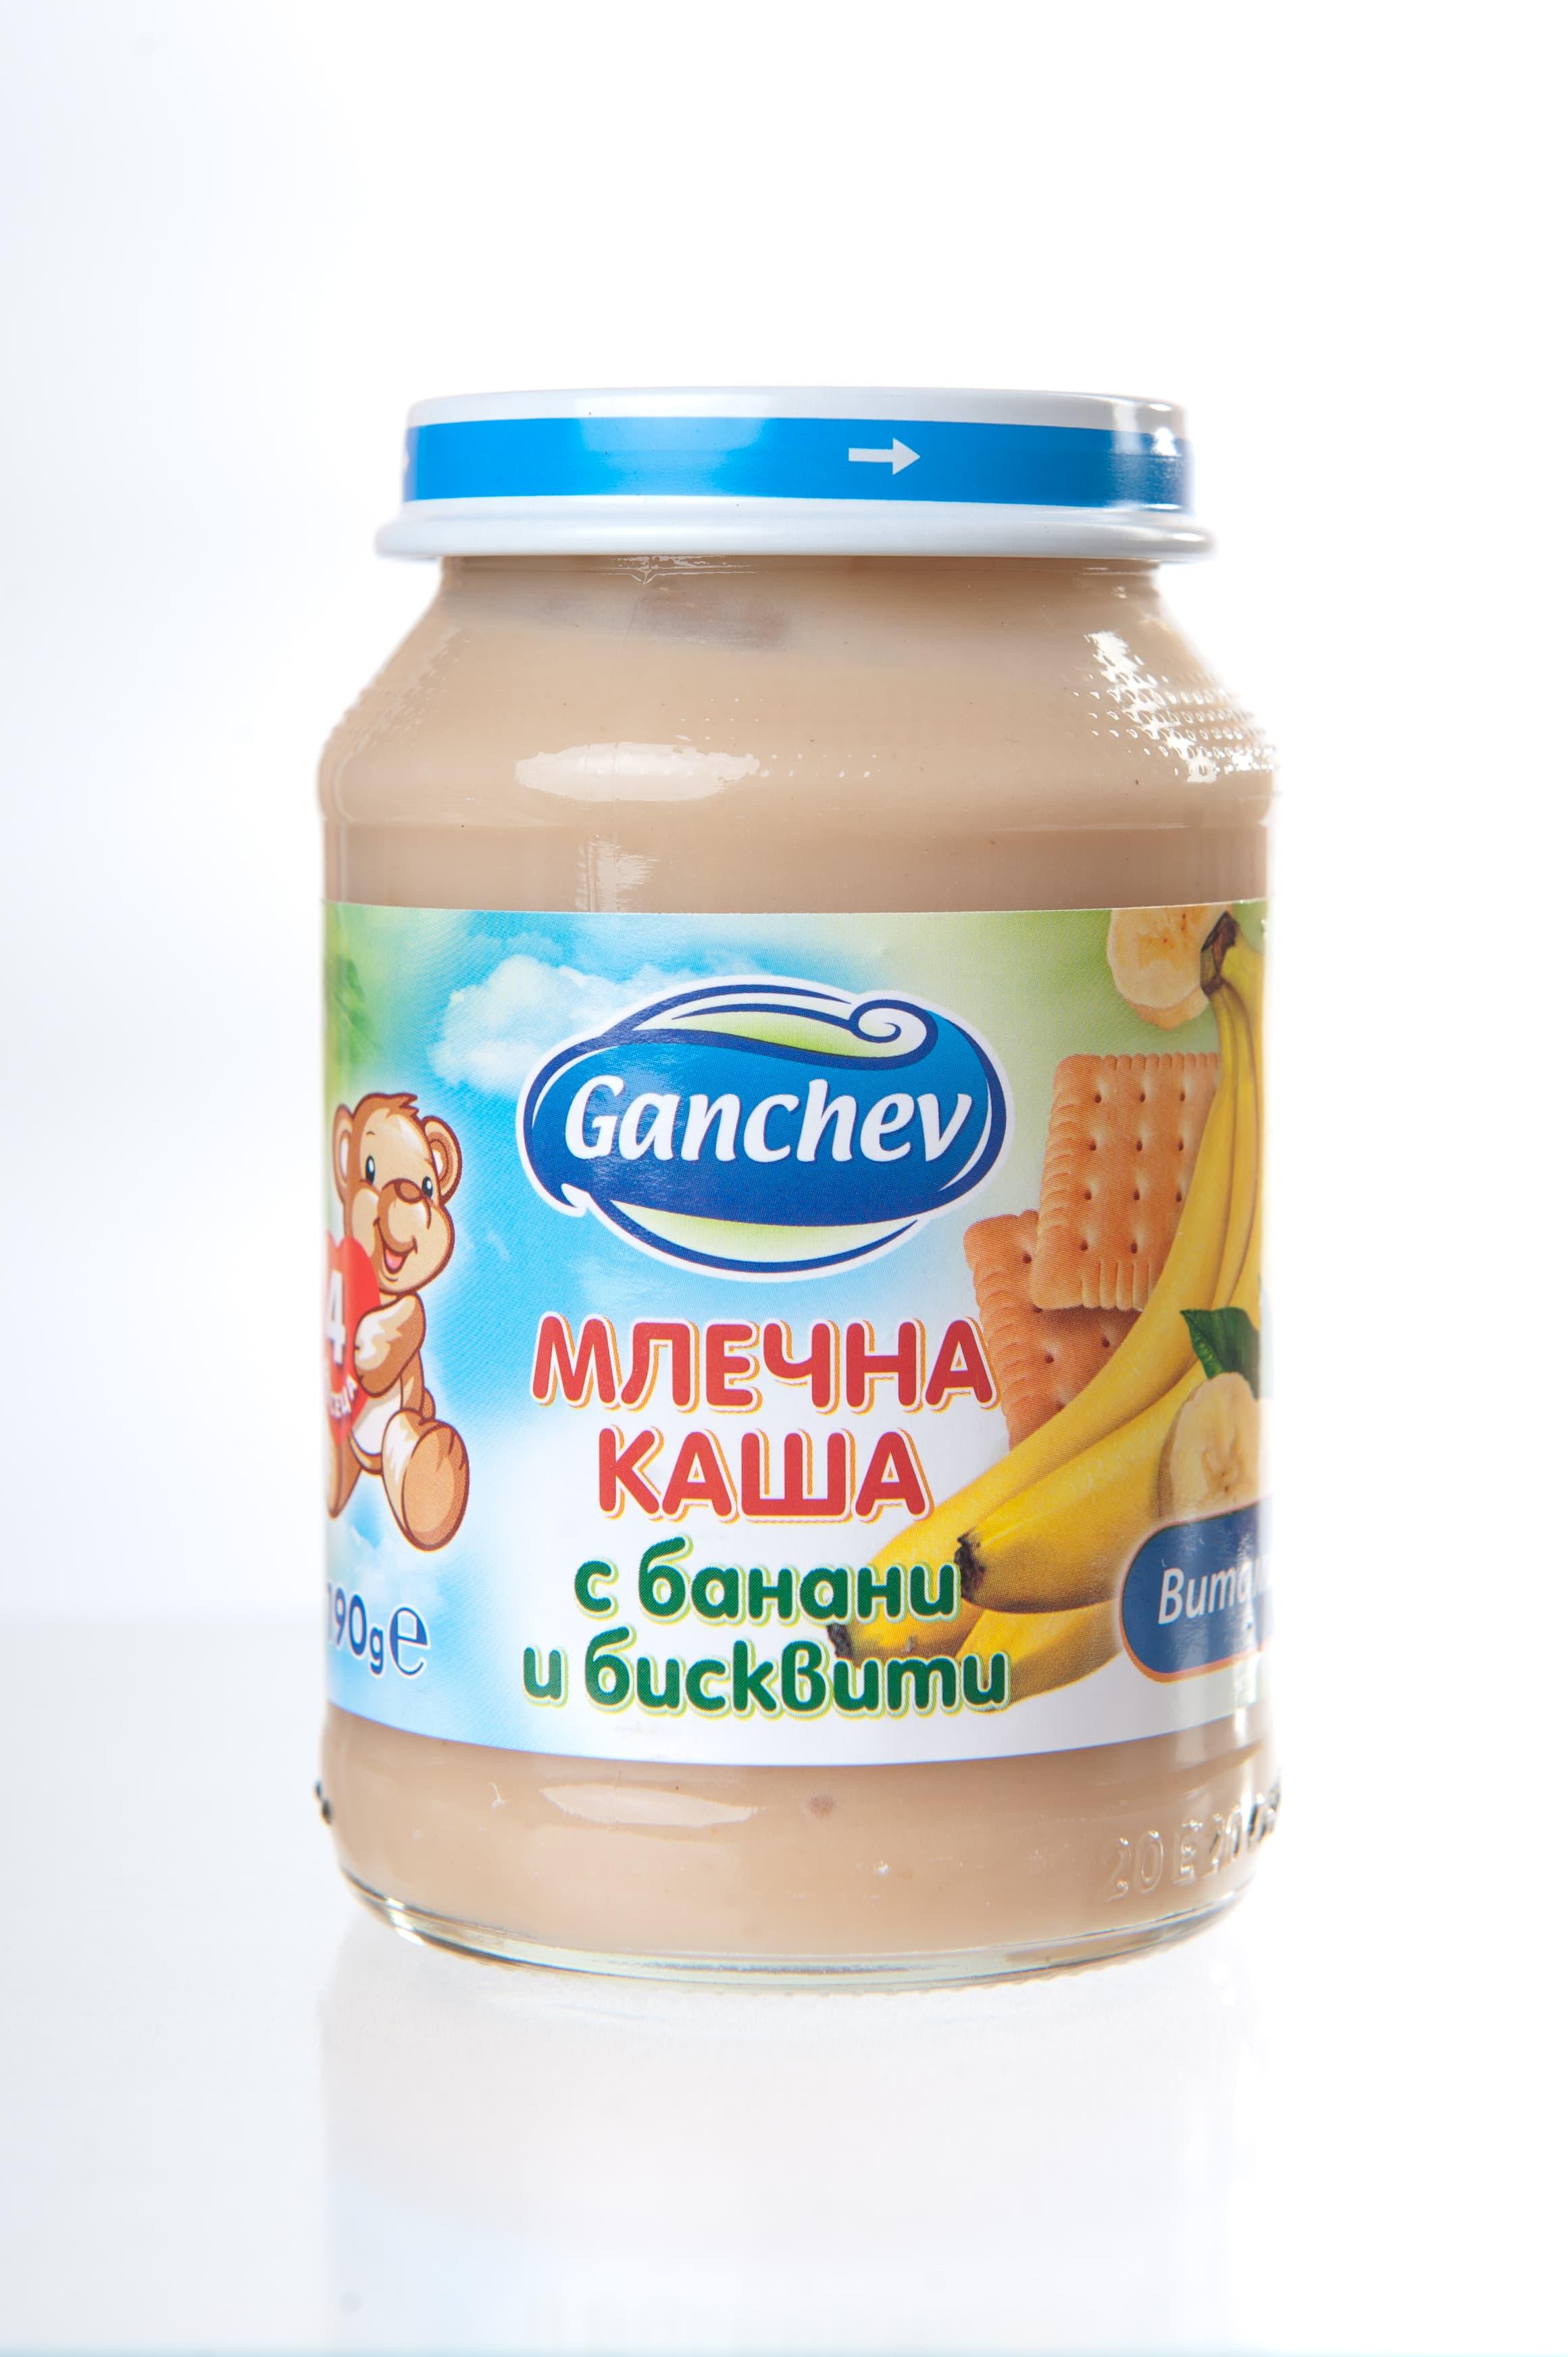 Ganchev-млечна каша с банани и бисквити 4м+190гр